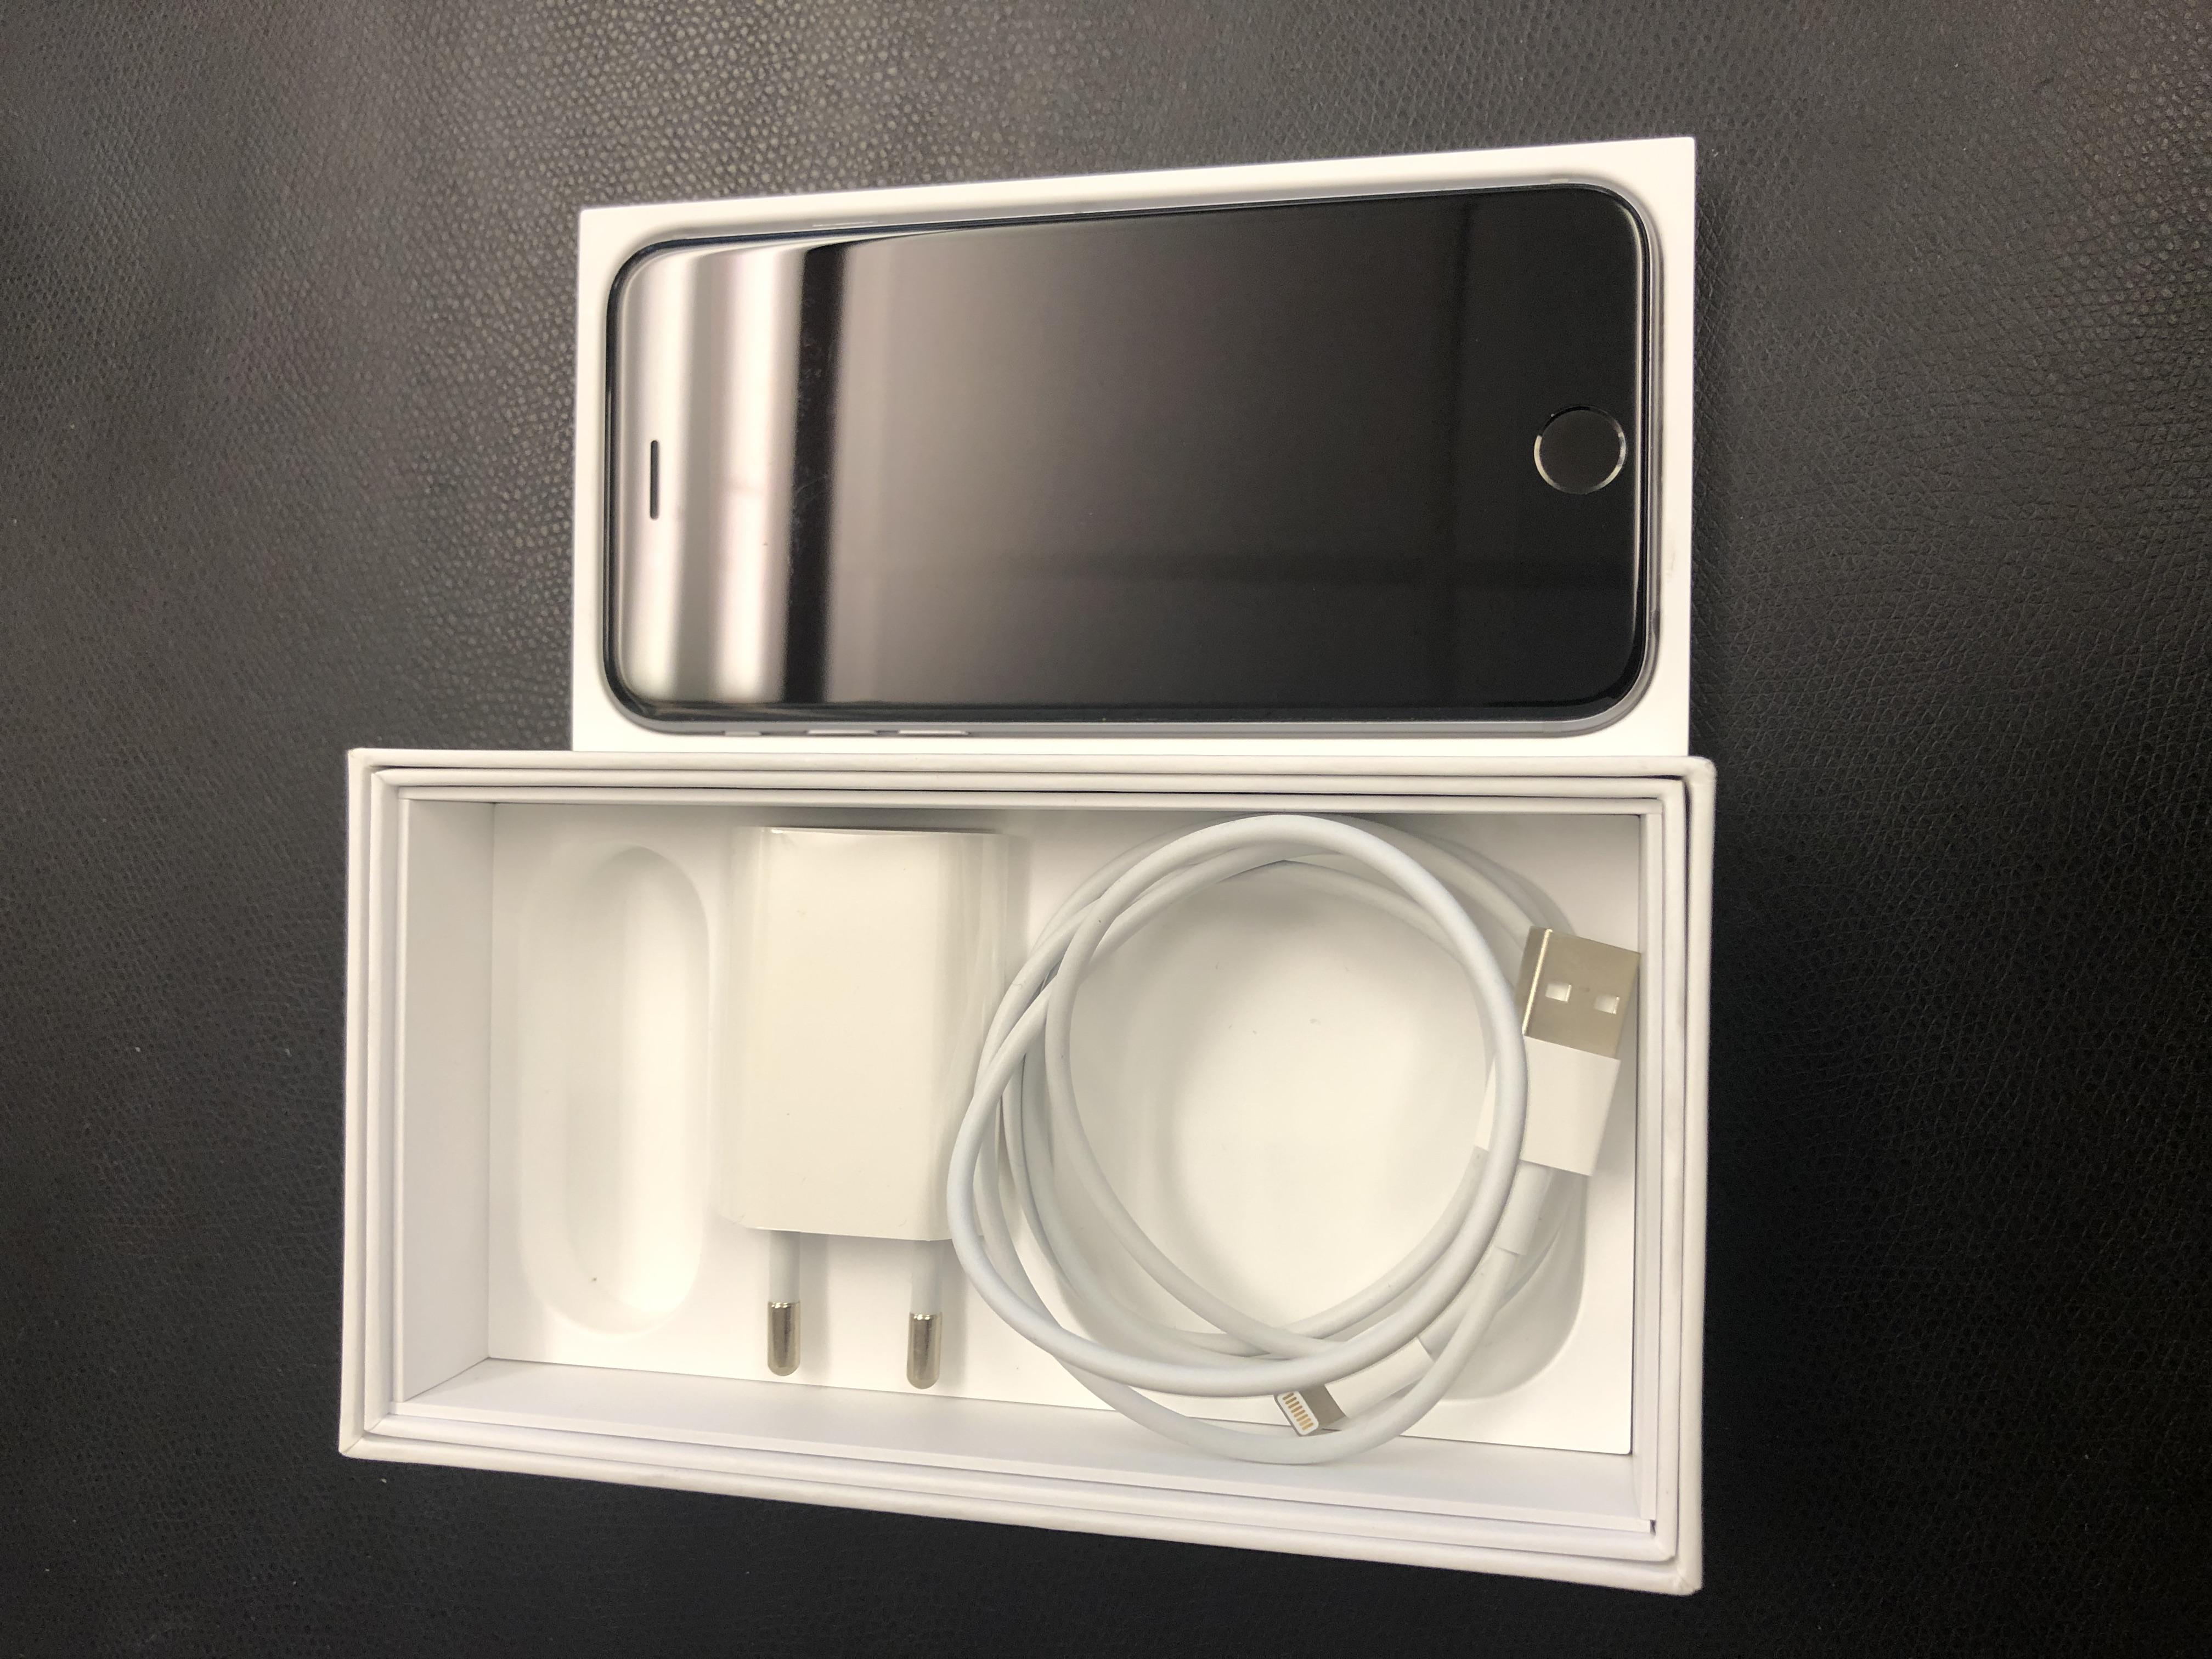 iPhone 6S 16GB, 32GB, Gray, bild 2